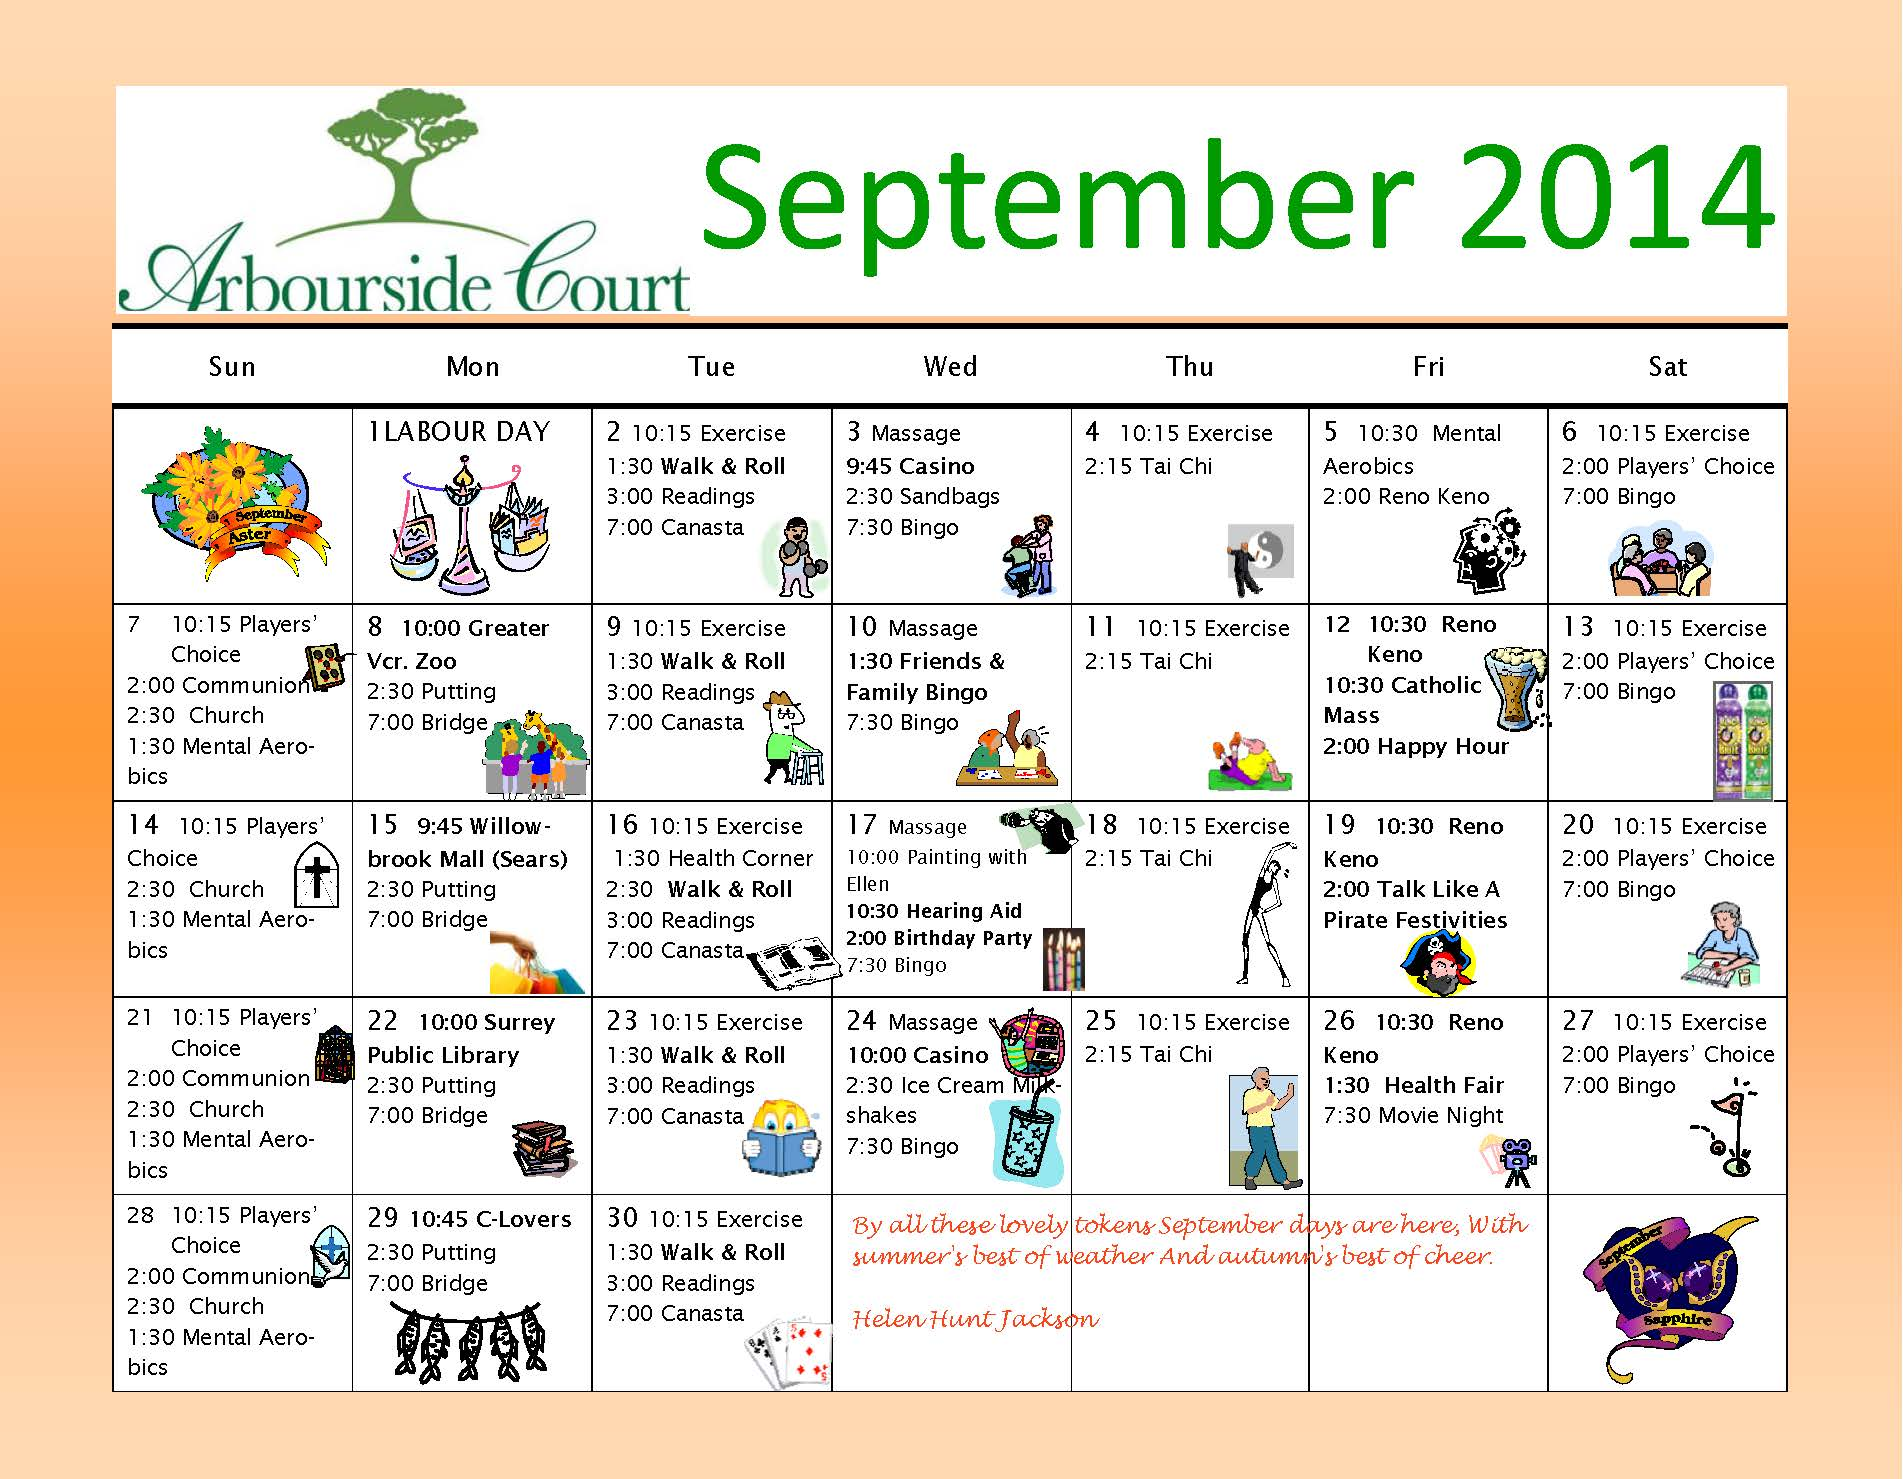 Calendar Ideas For Elderly : Senior activity calendar party invitations ideas